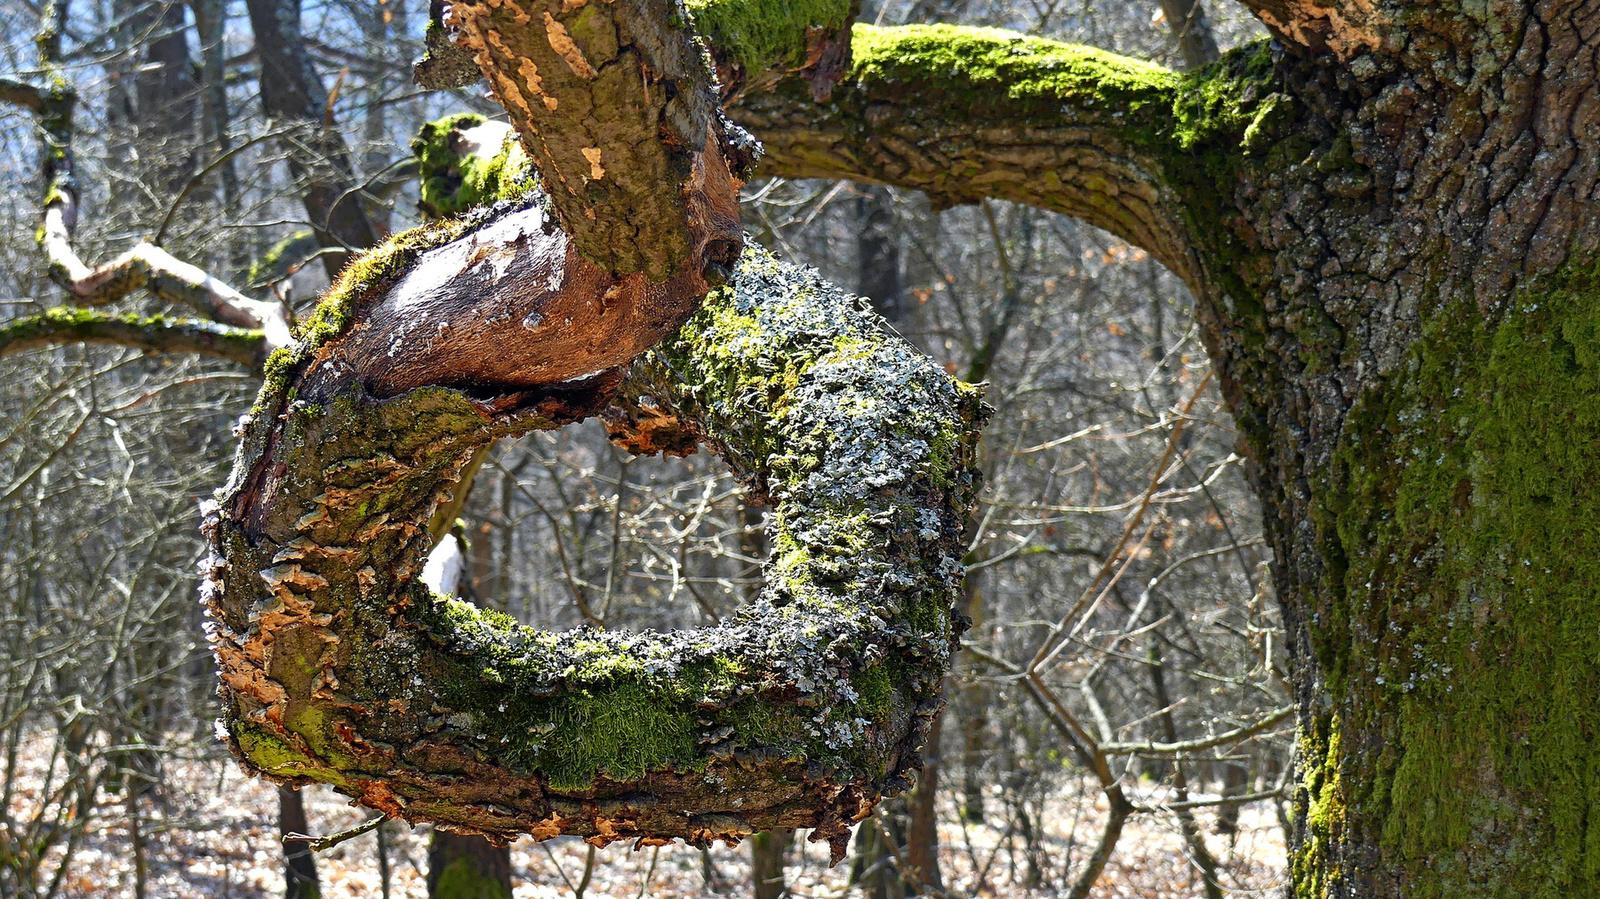 05 Hurok a fán